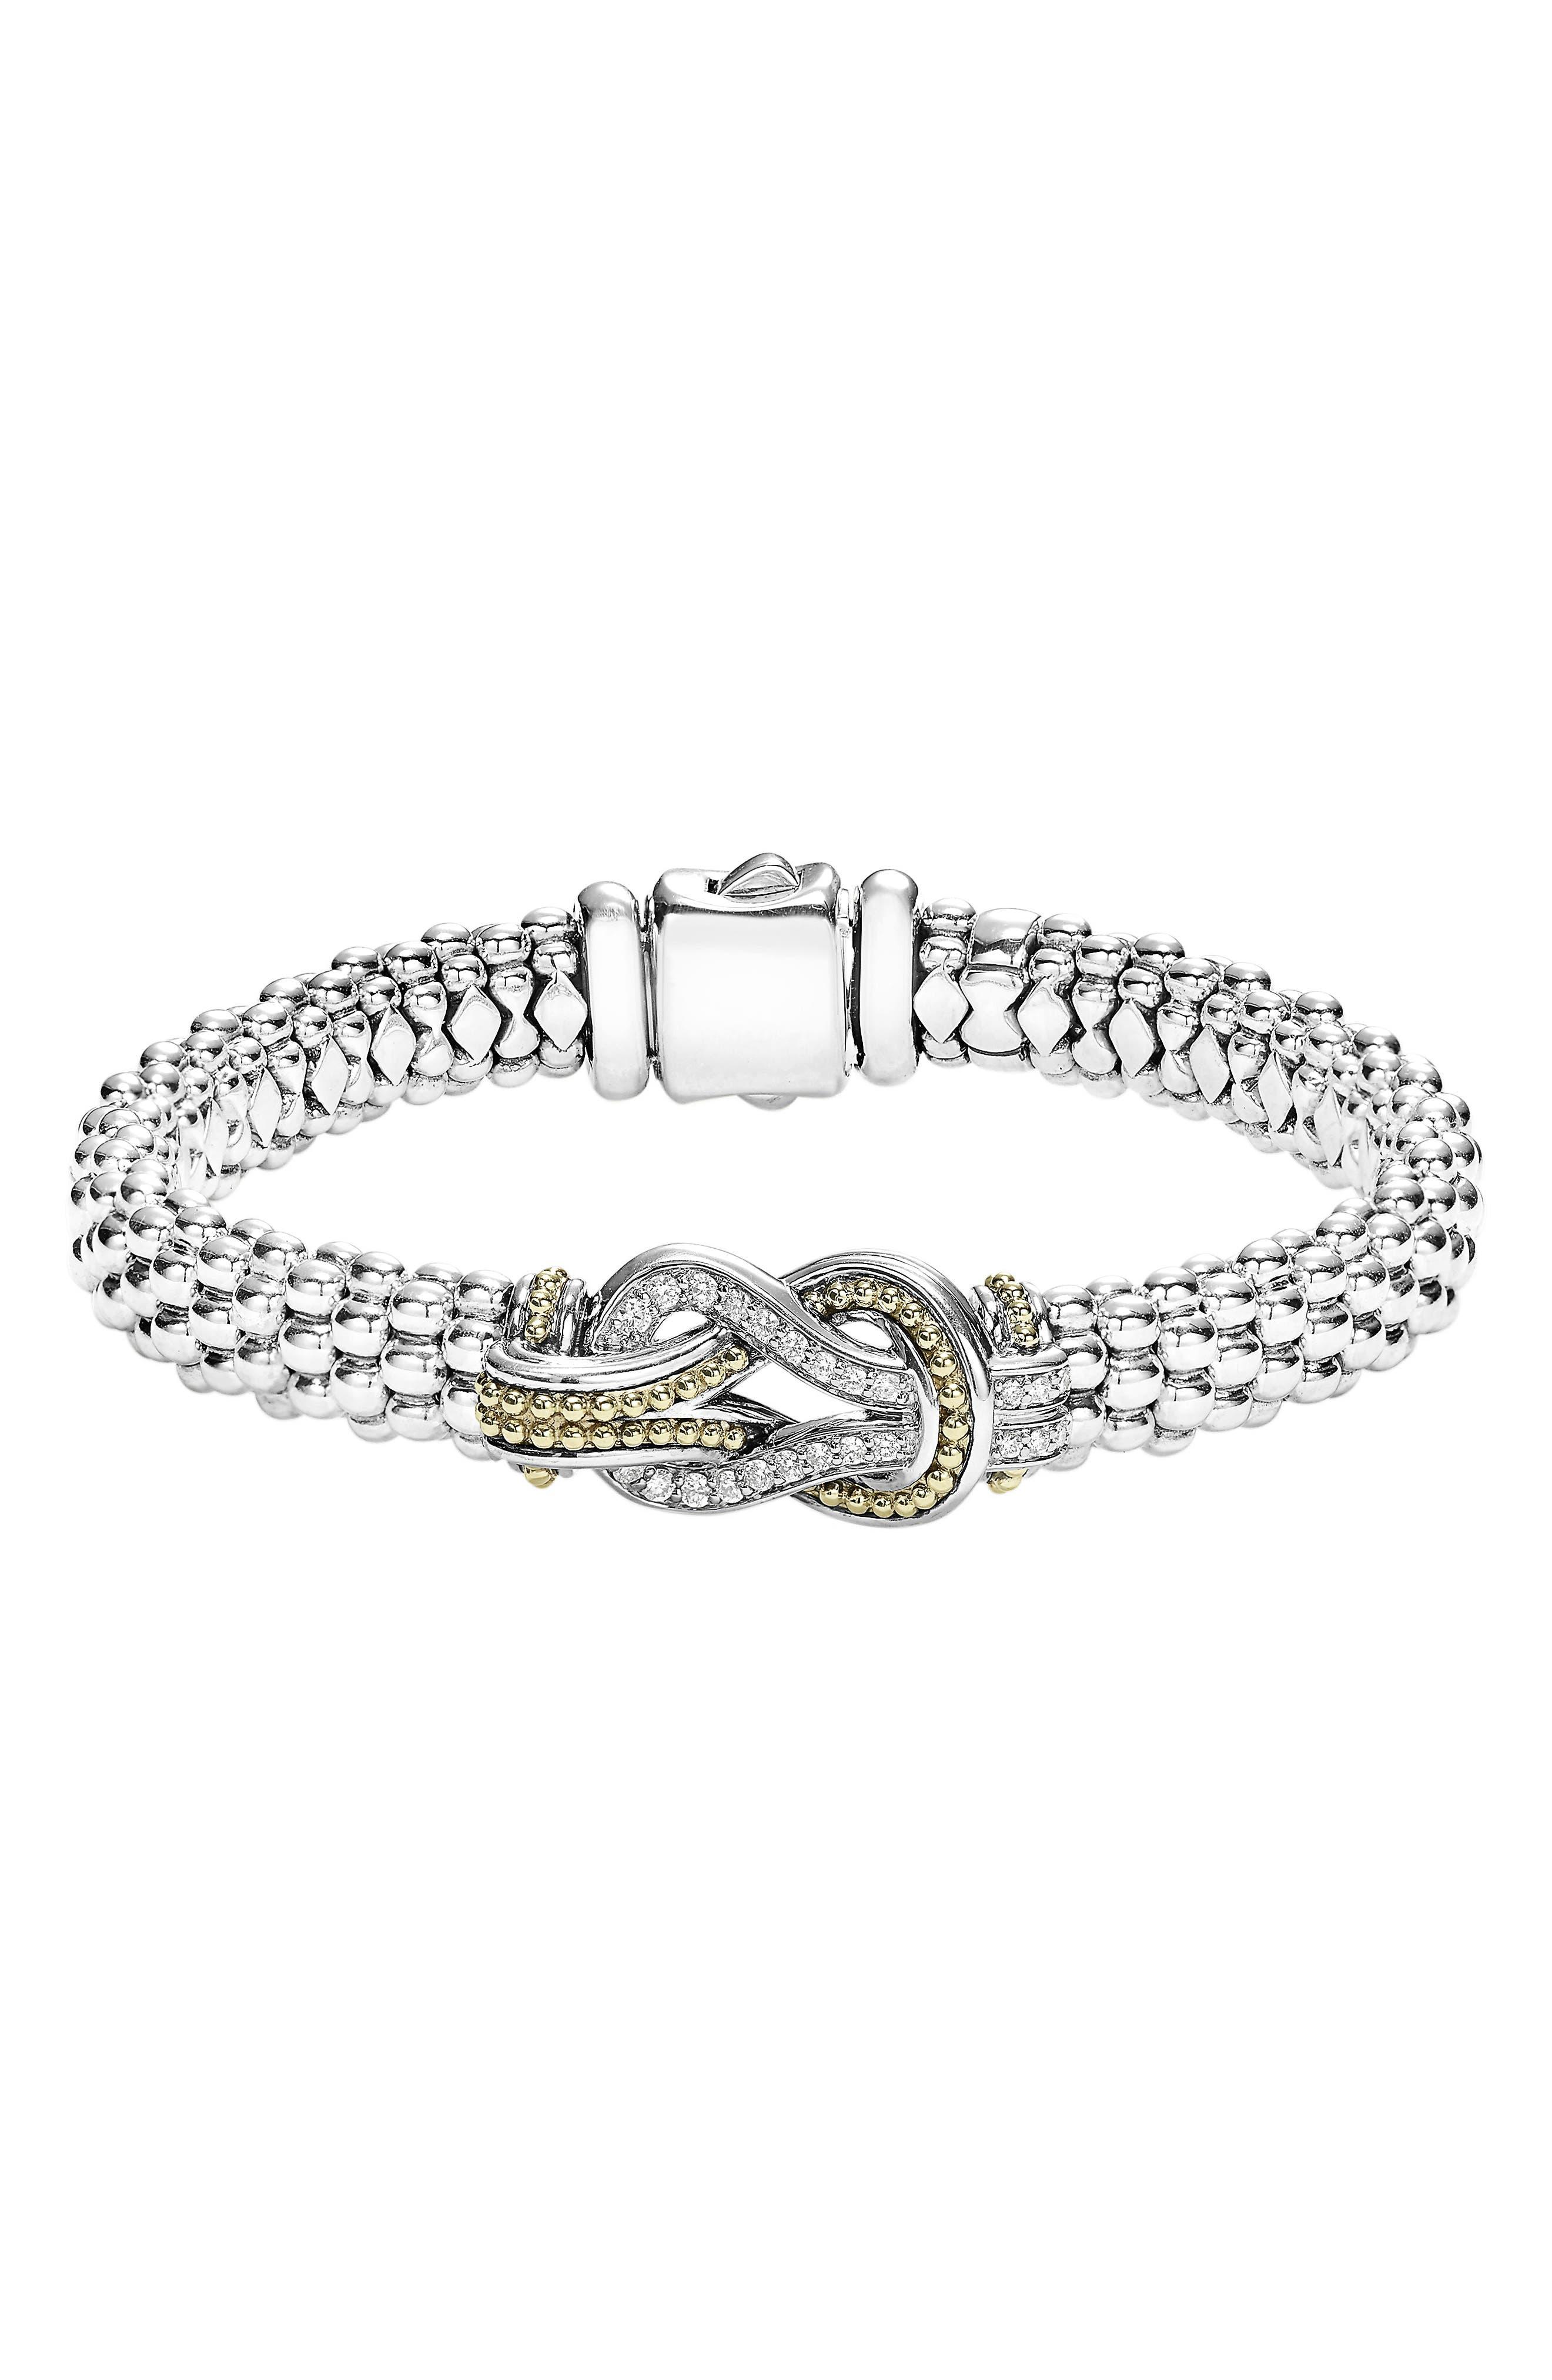 Caviar Newport Diamond Station Bracelet,                         Main,                         color, SILVER/ GOLD